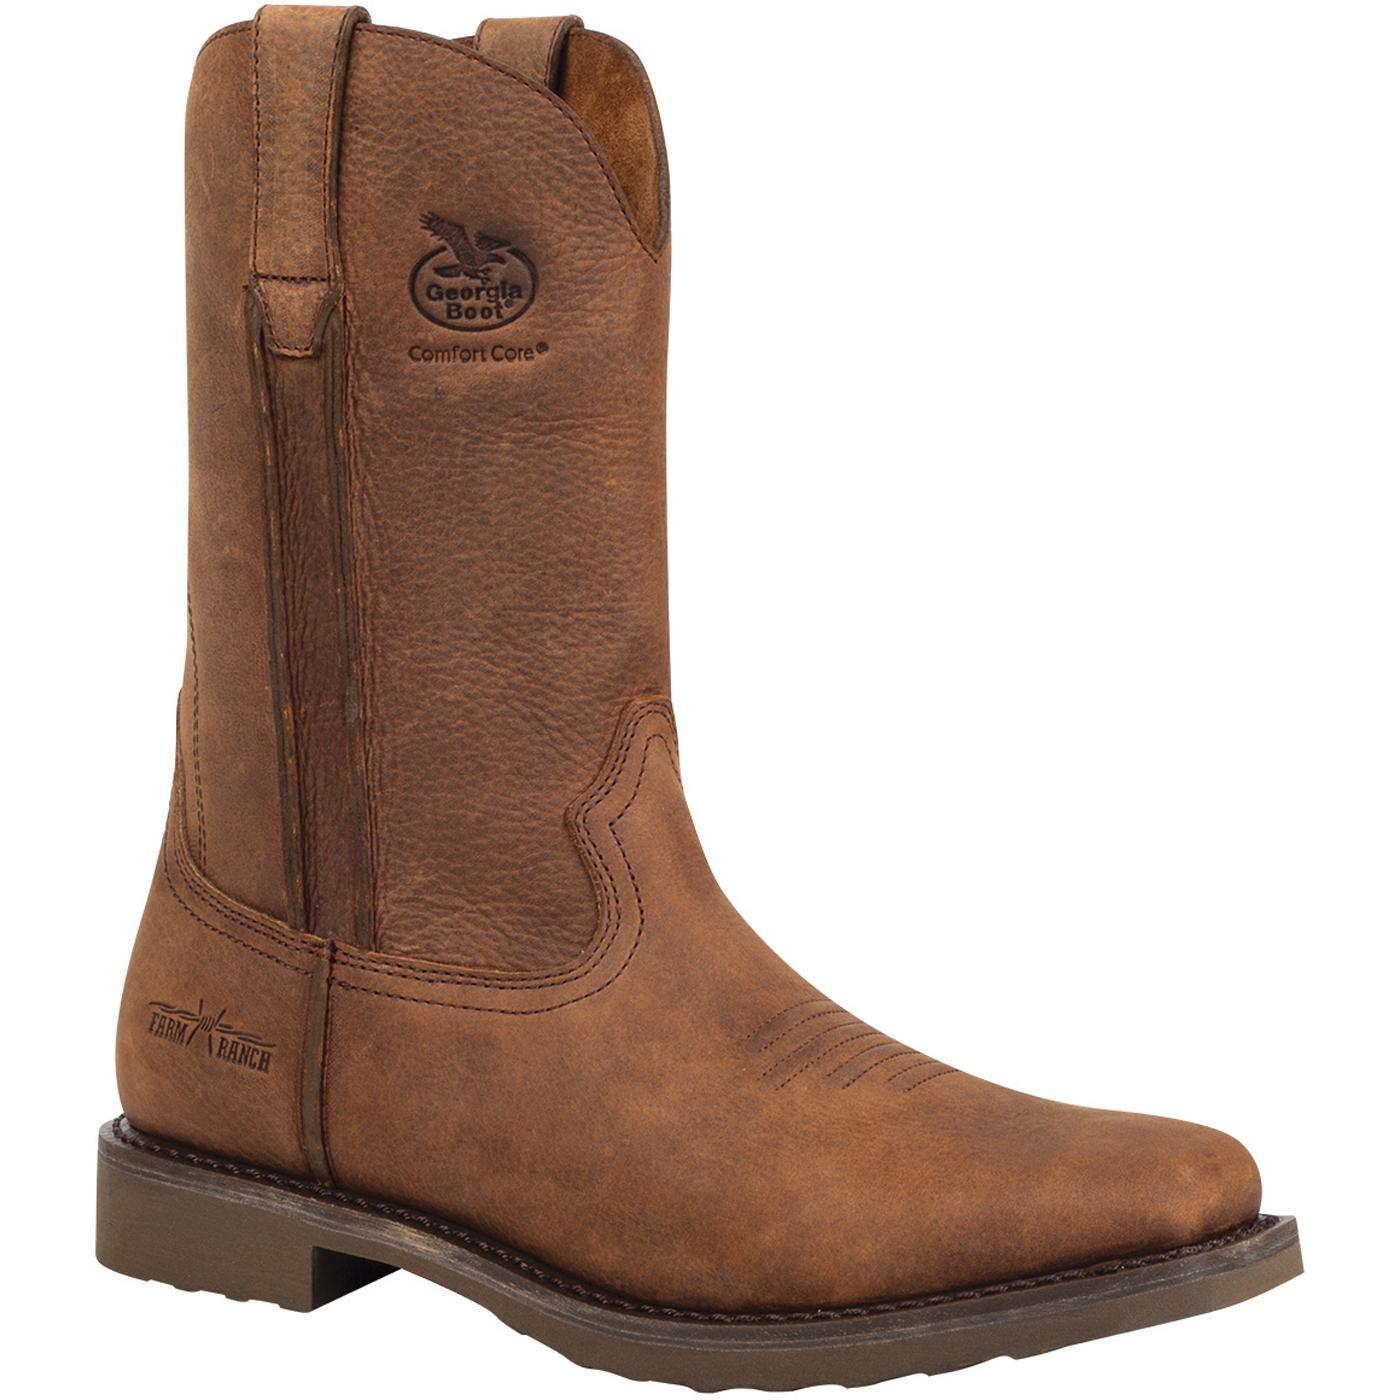 a6452d12801 Georgia Boot Carbo-Tec Men's Composite-Toe Wellington Work Boots ...